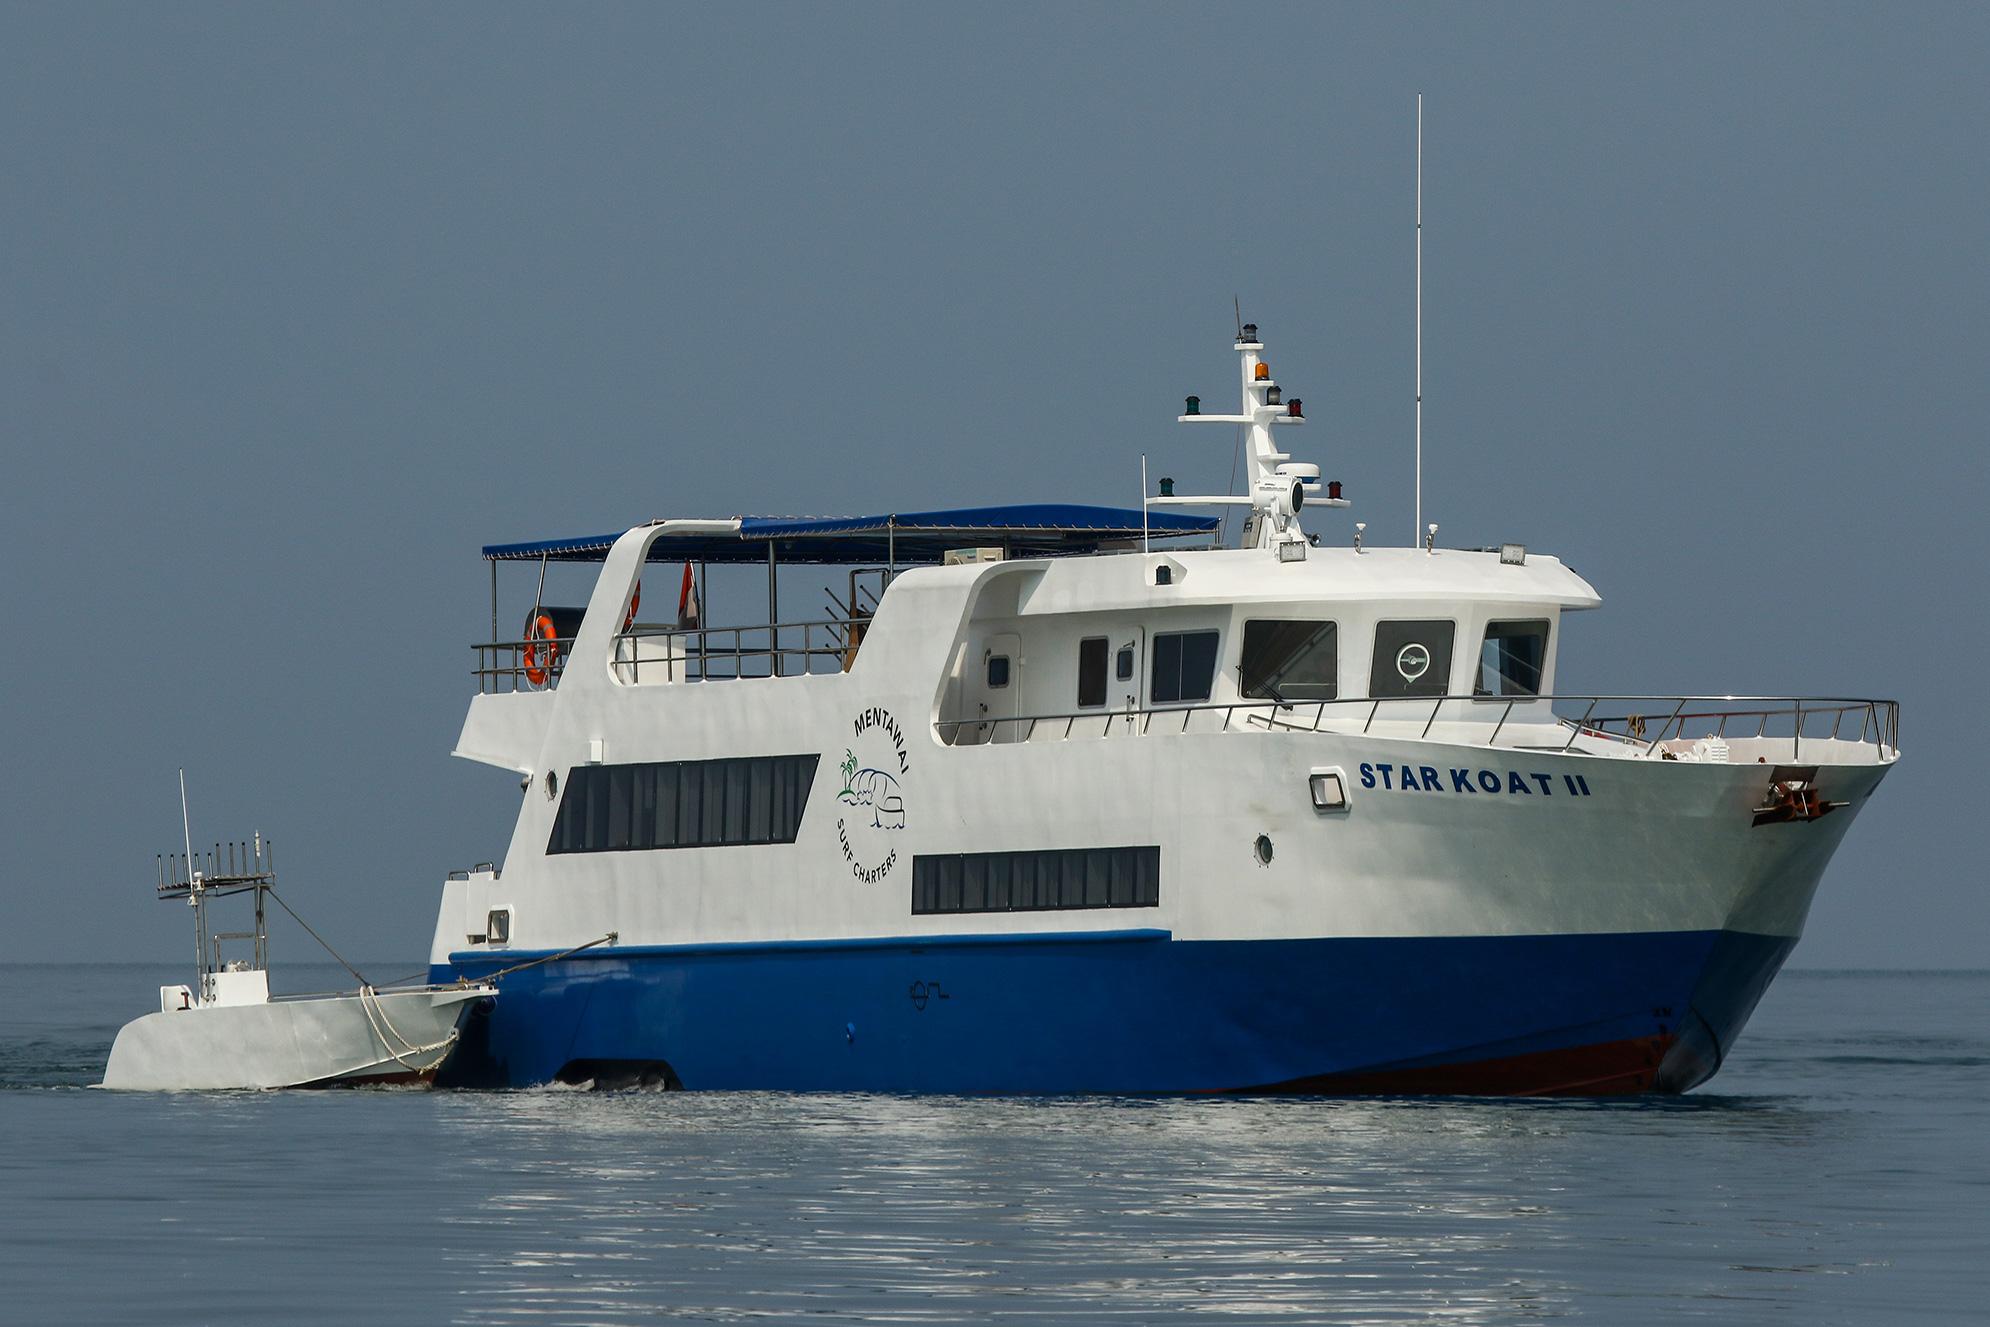 Star Koat 2 Boat charter